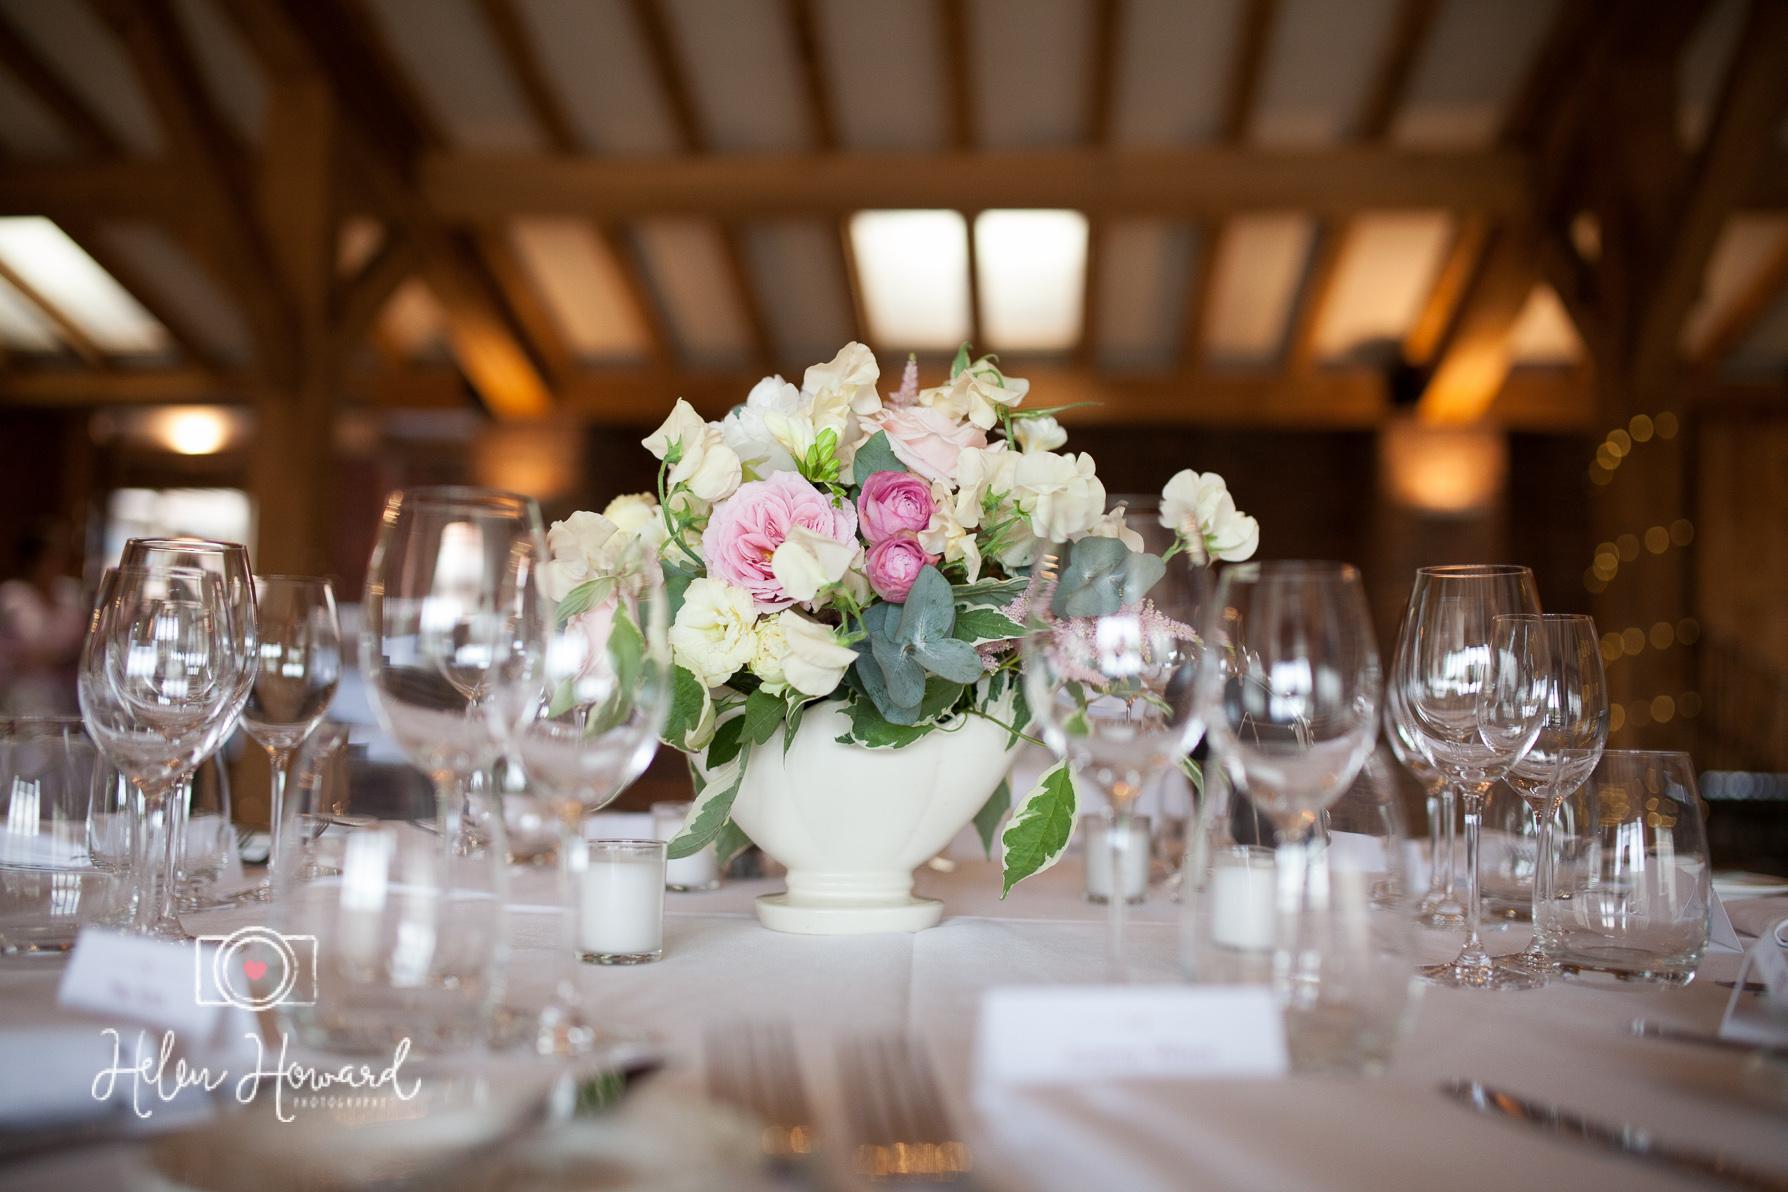 Helen Howard Photography Packington Moor Wedding-26.jpg